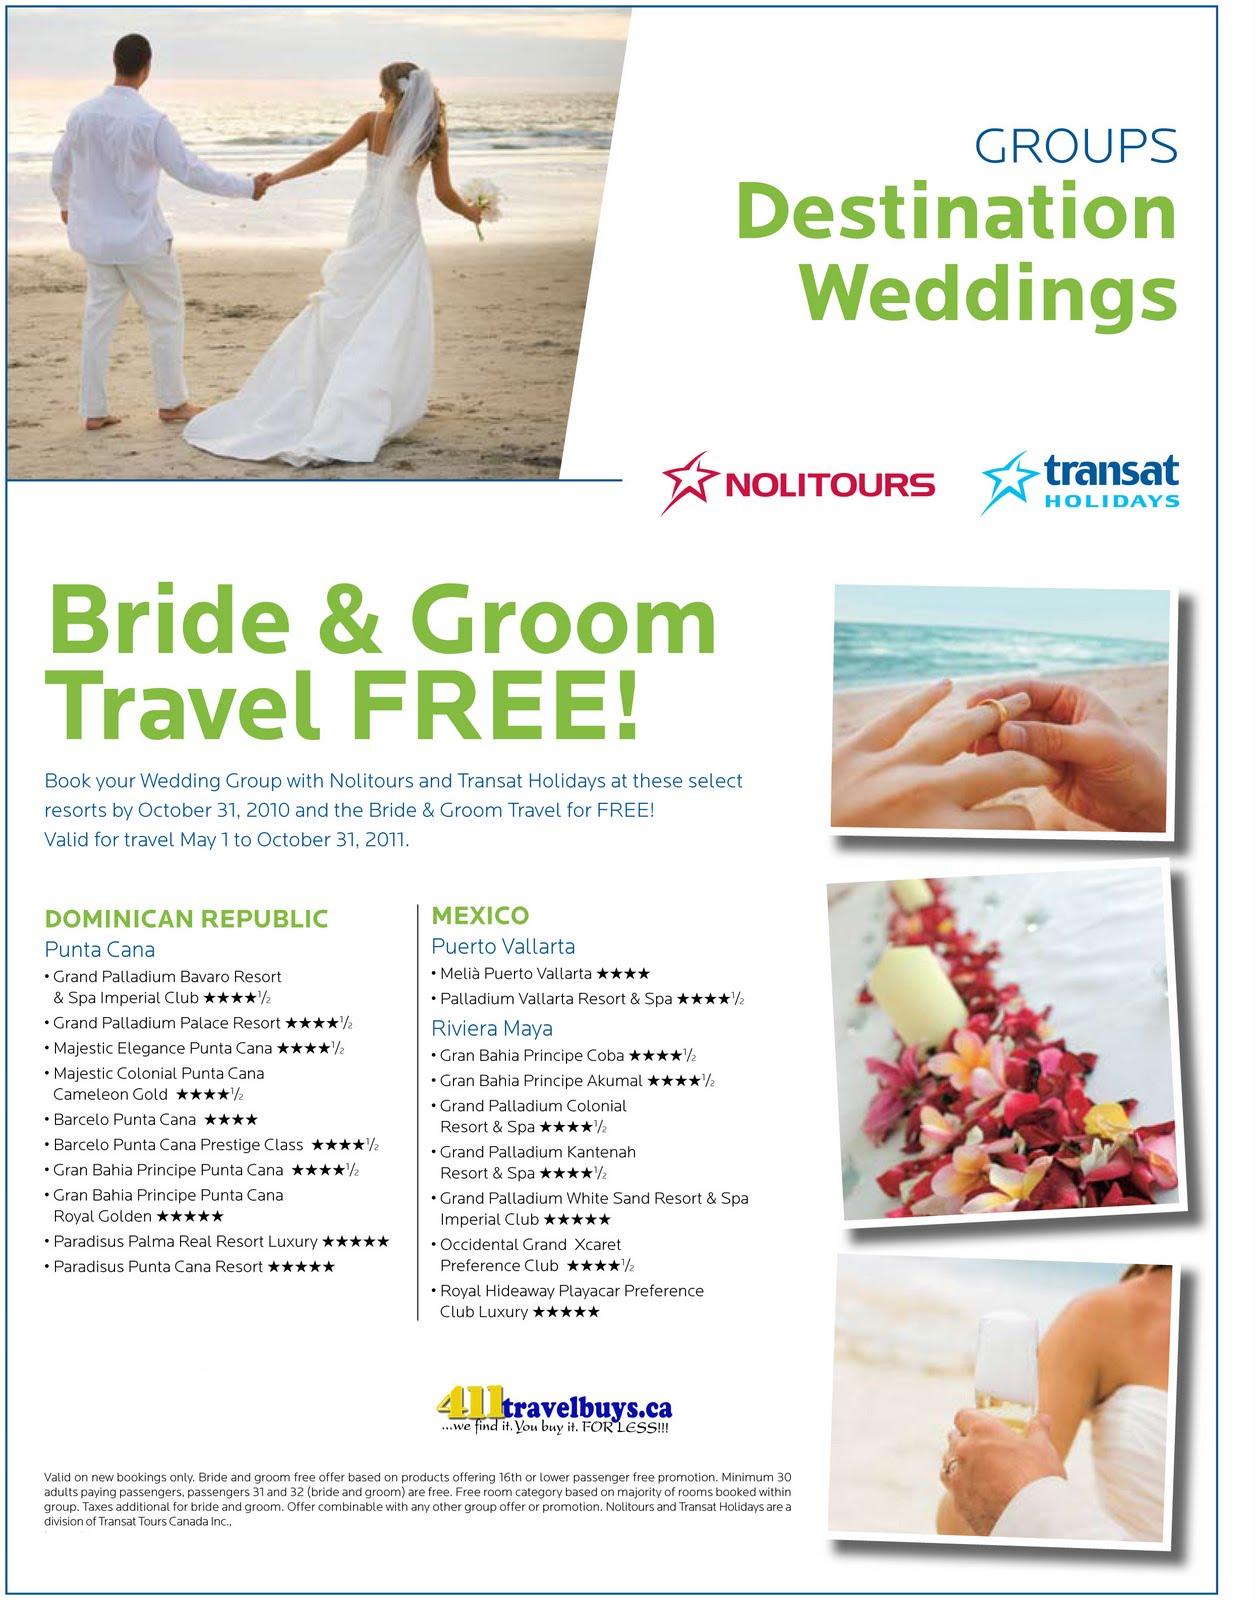 Bonanza May 2011: 411 Travelbuys Blog: 411 TRAVELBUYS: Wedding Groups